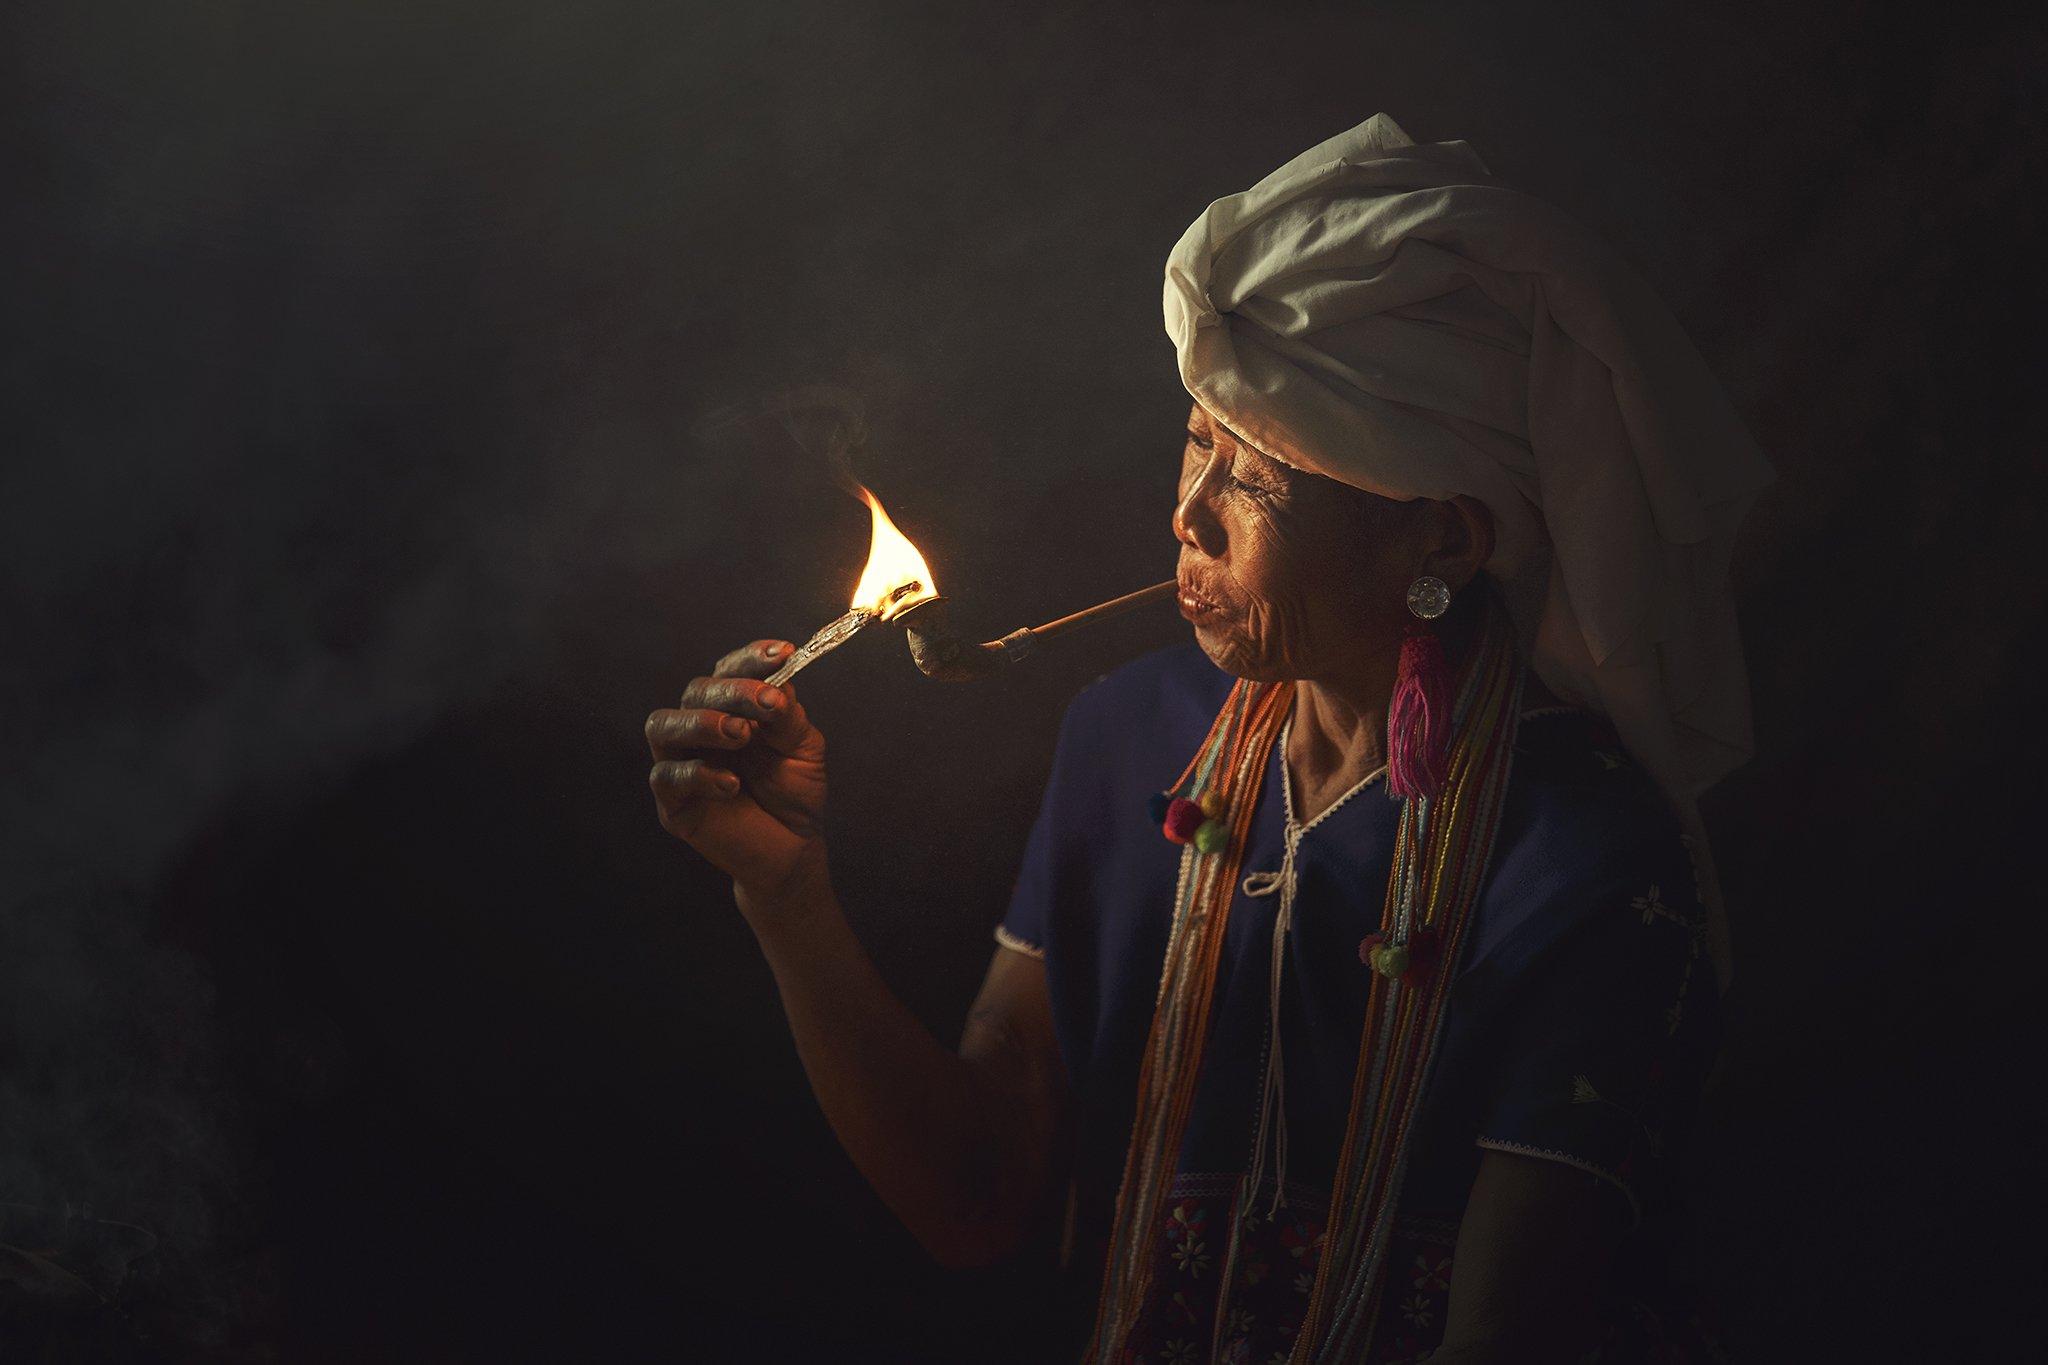 Asia, Asian, Chaina, Fire, Indoor, Light, Moning, Smoke, Thai, Woman, Saravut Whanset